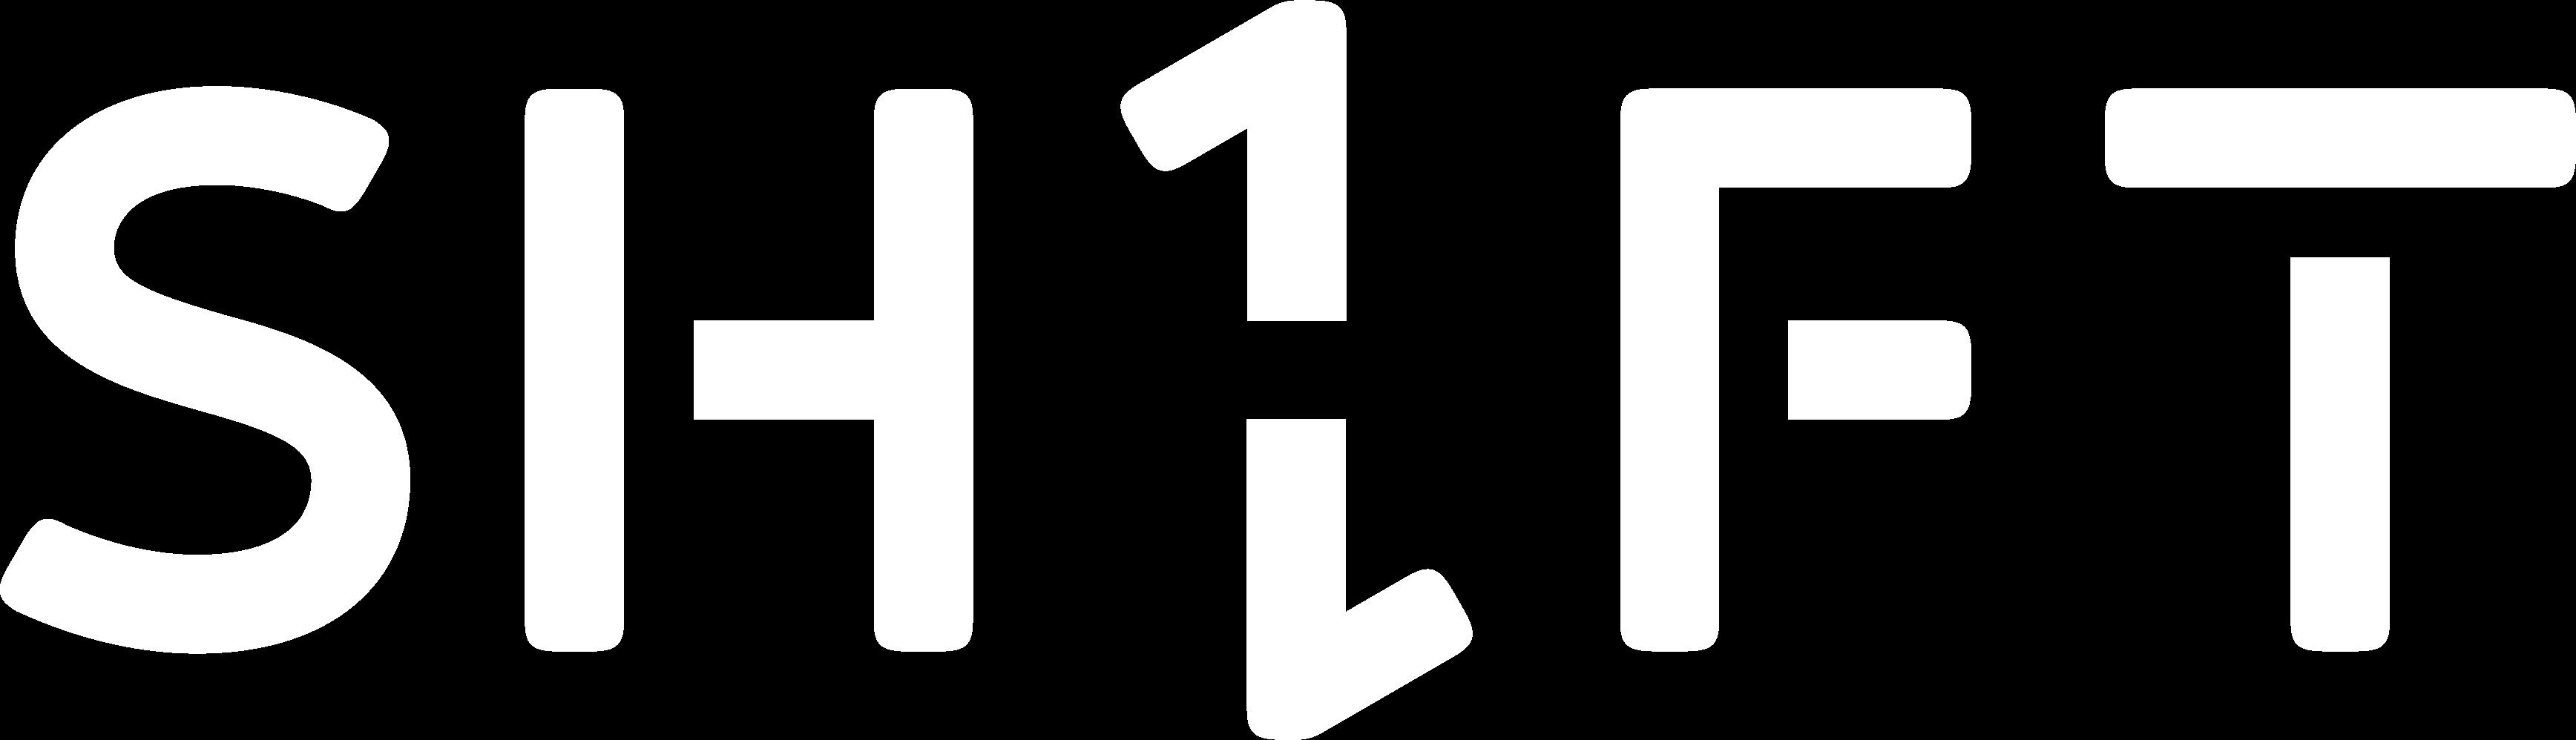 SH1FT logo